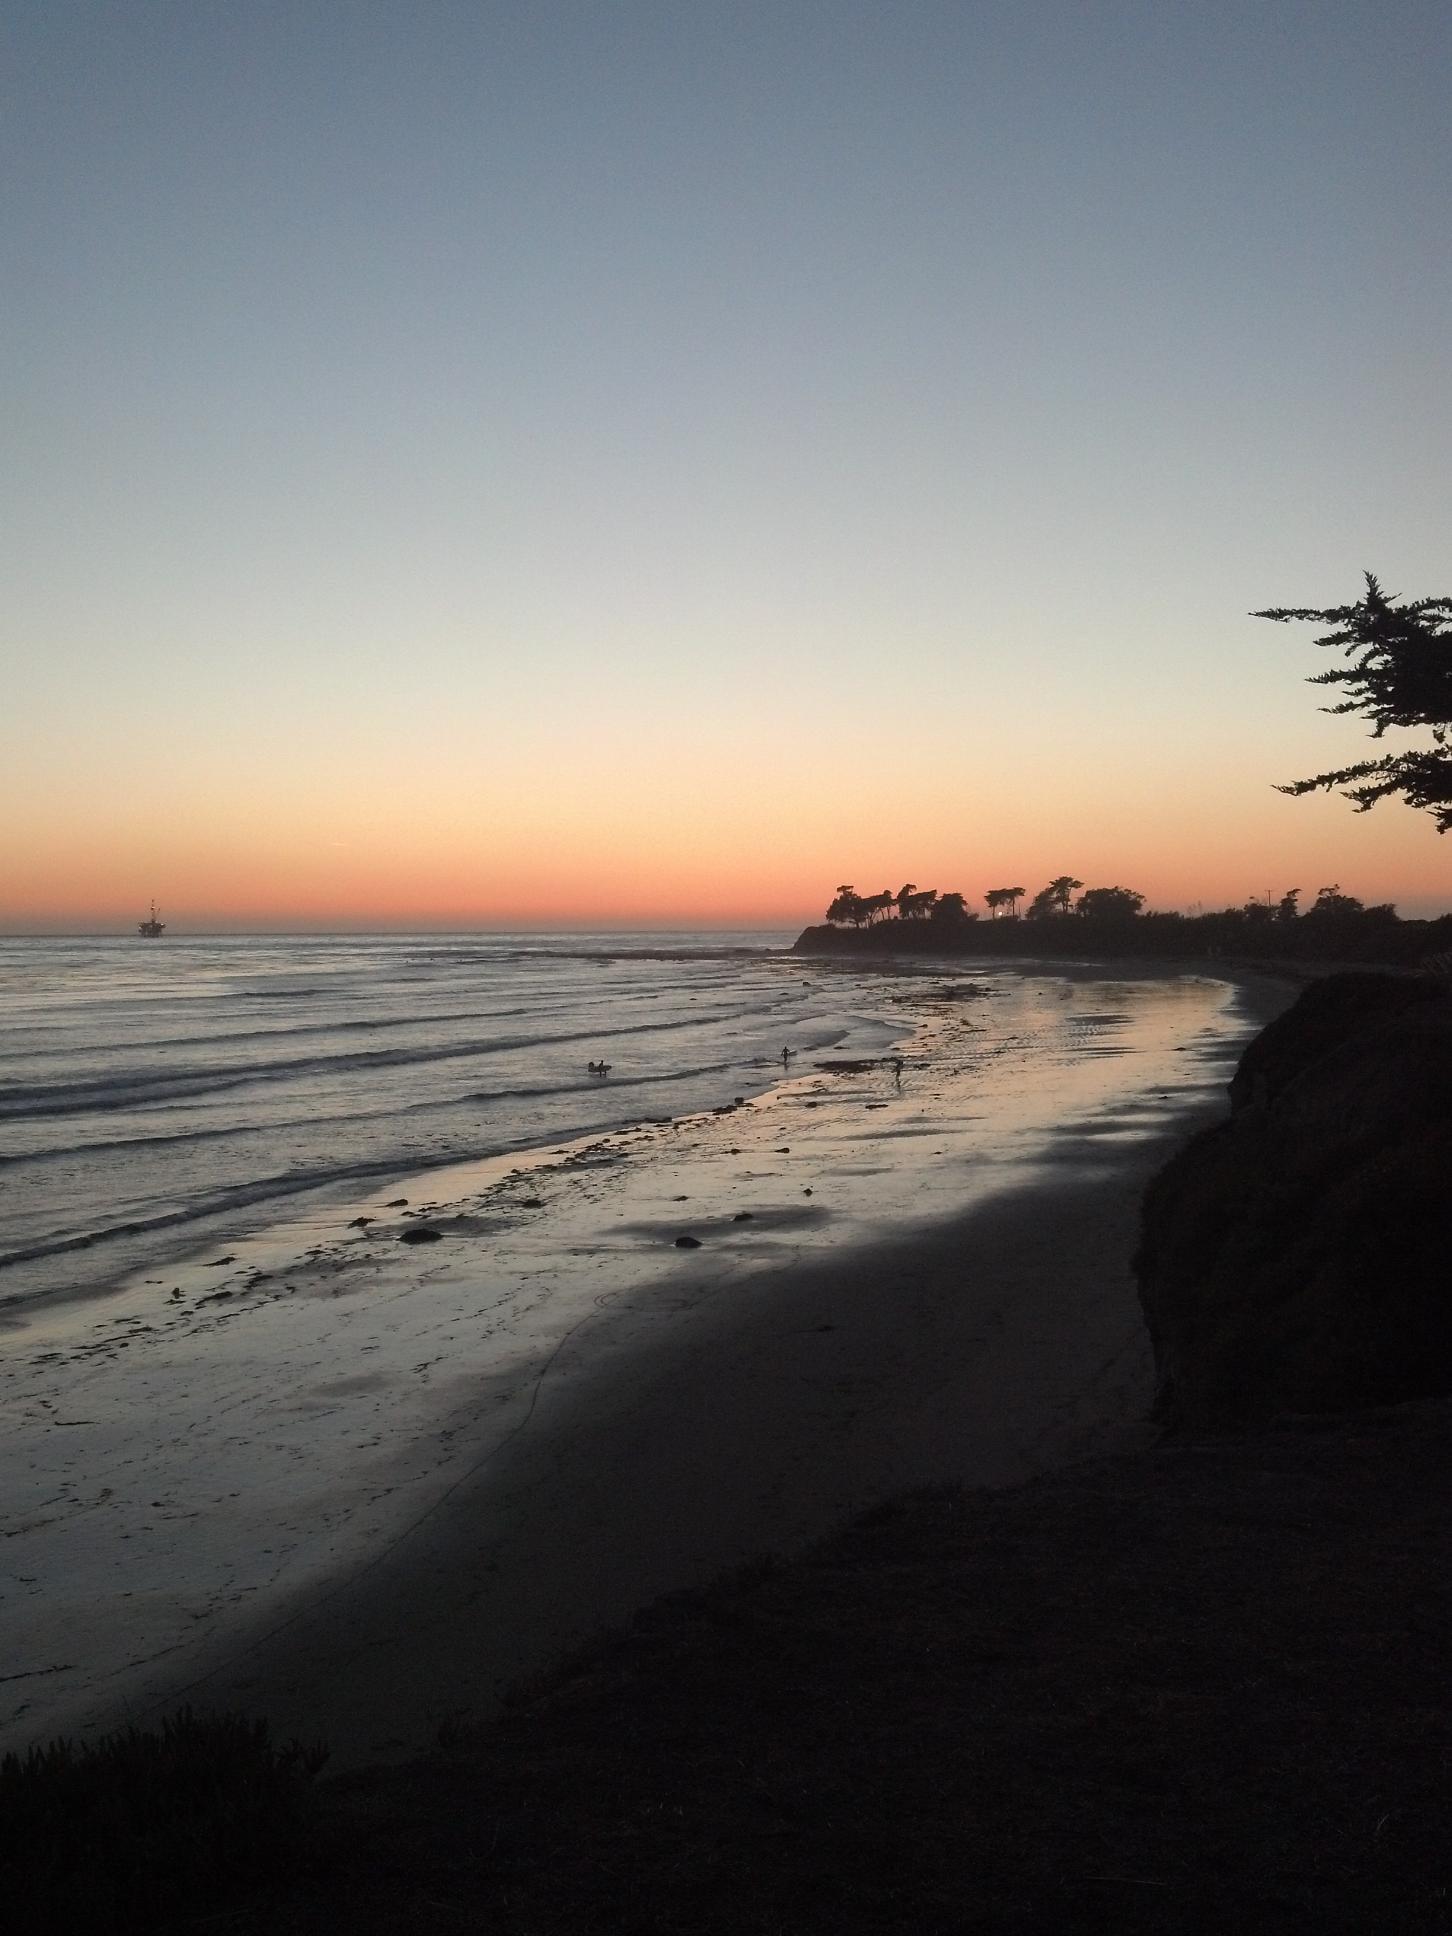 The beautiful sunset of Isla Vista